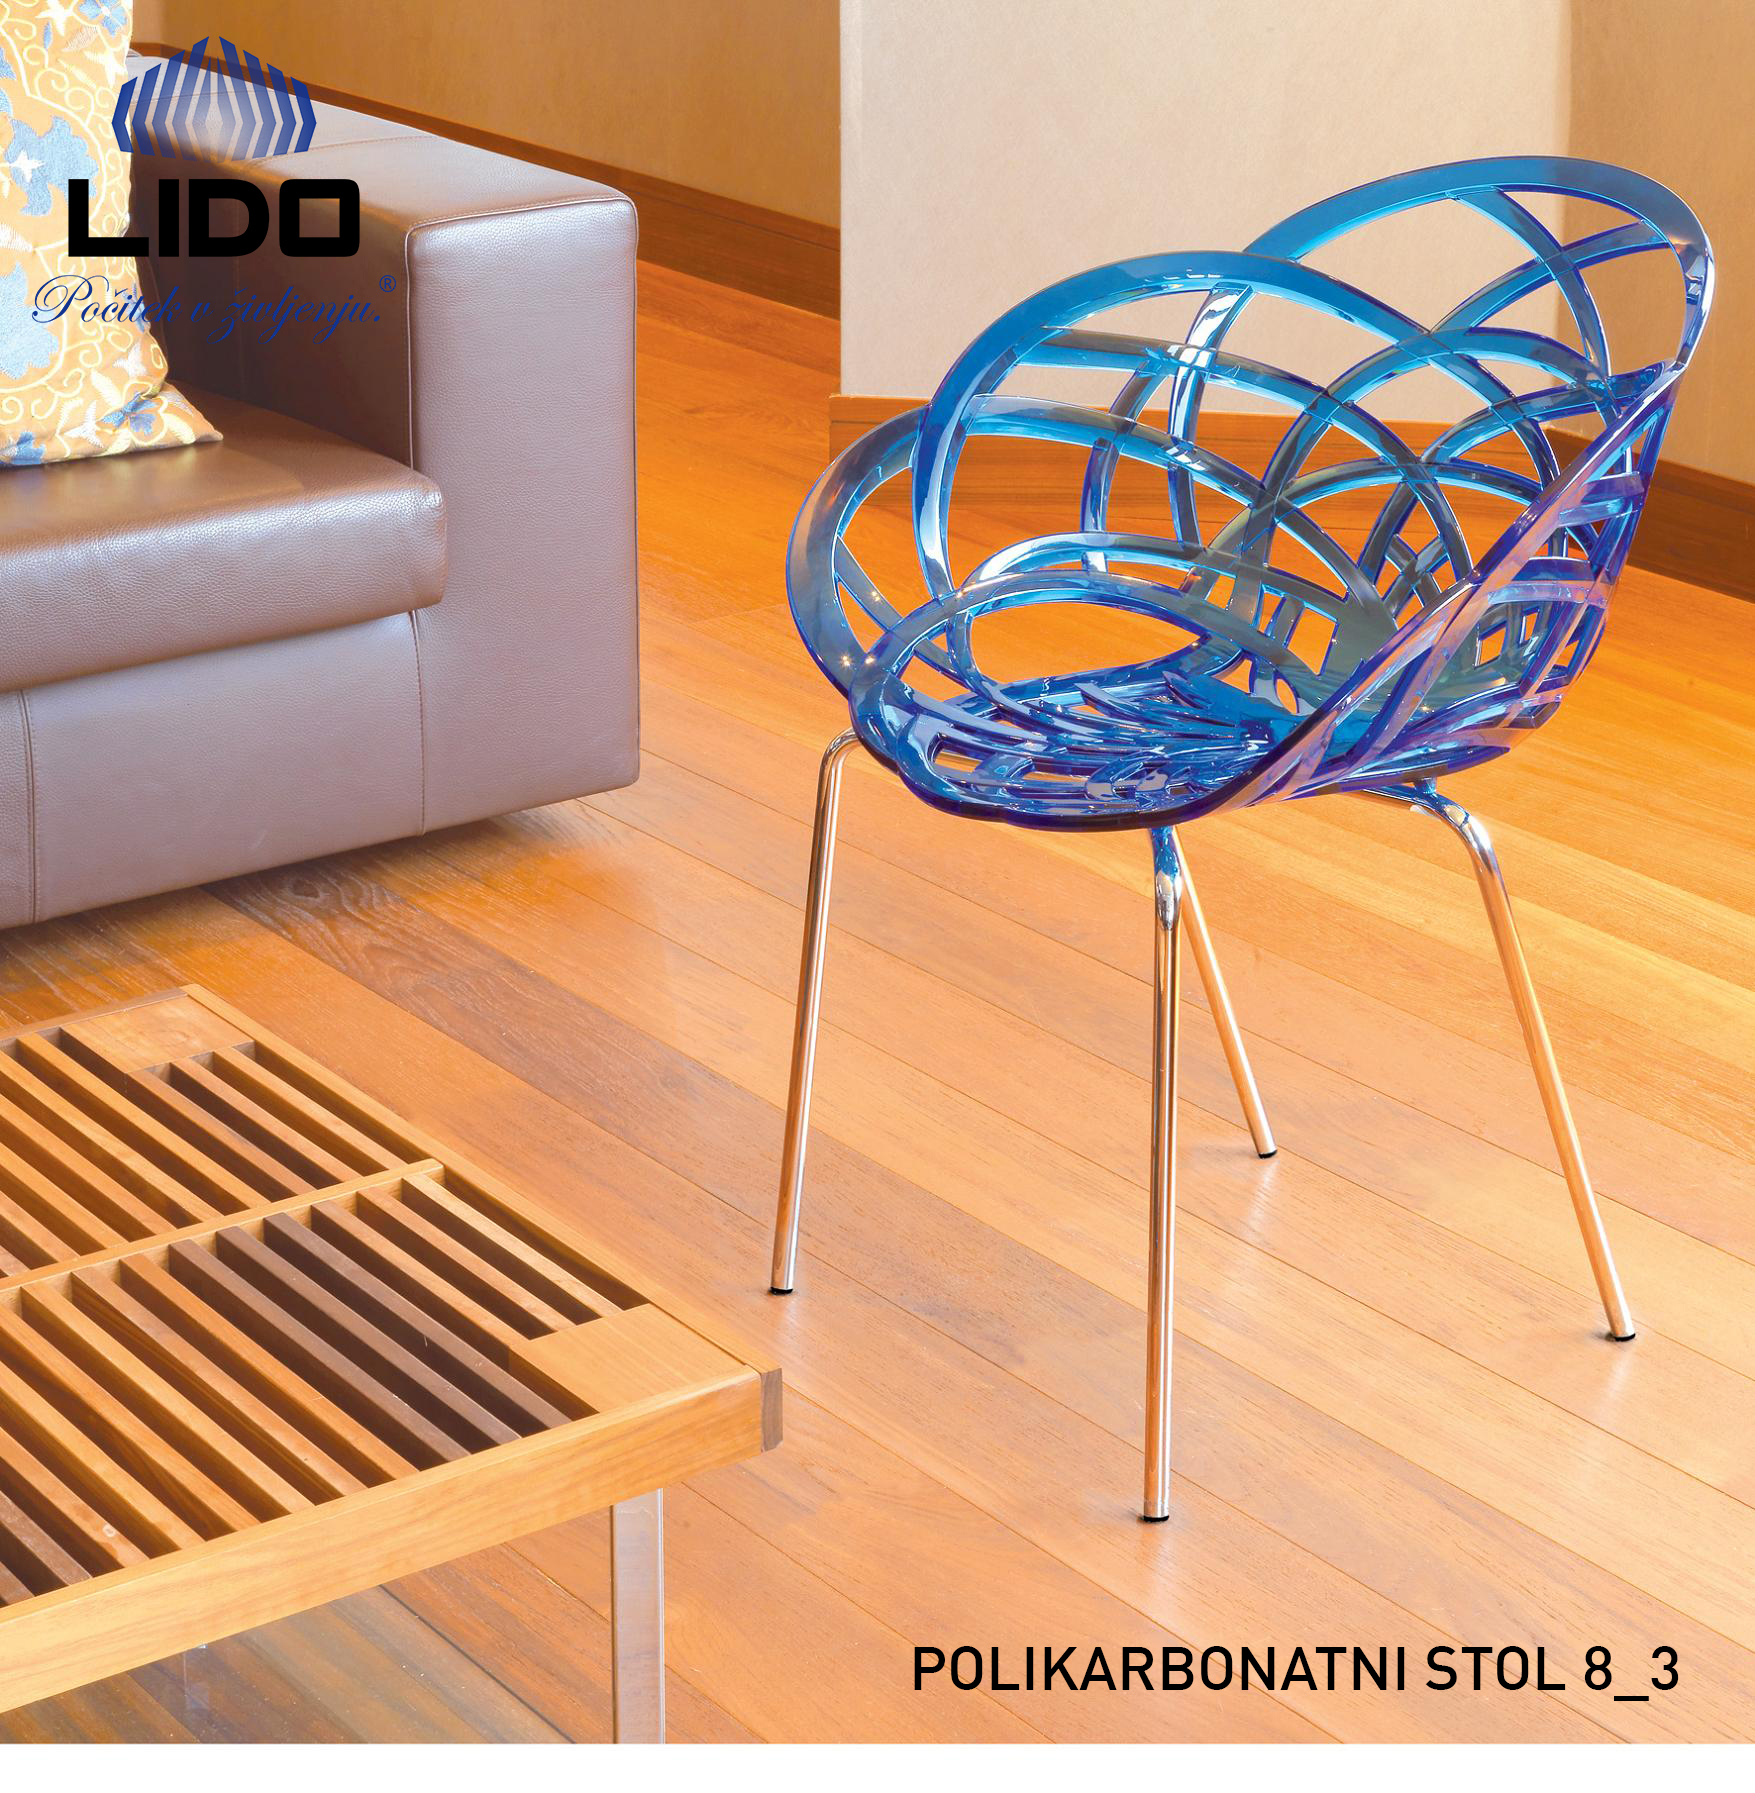 Lido_Polikarbonatni stoli 8_3